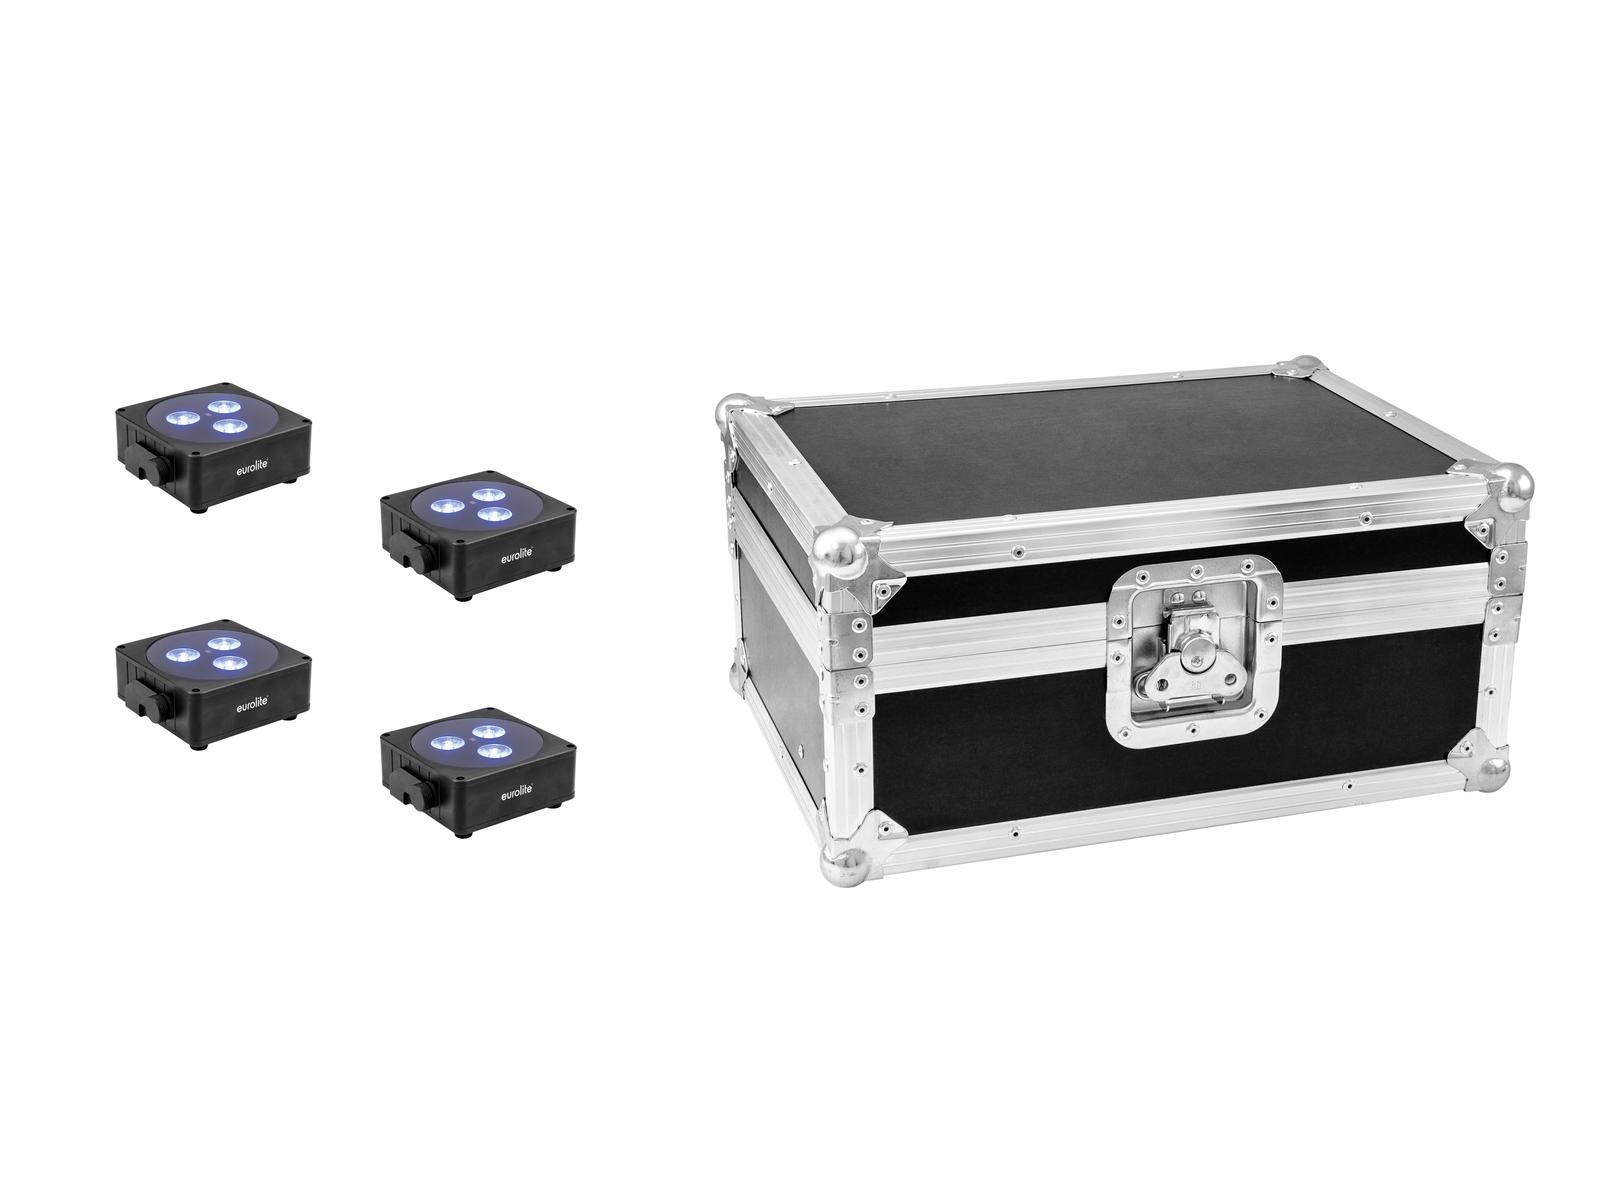 EUROLITE Set 4x AKKU Flat Light 3 sw + Case